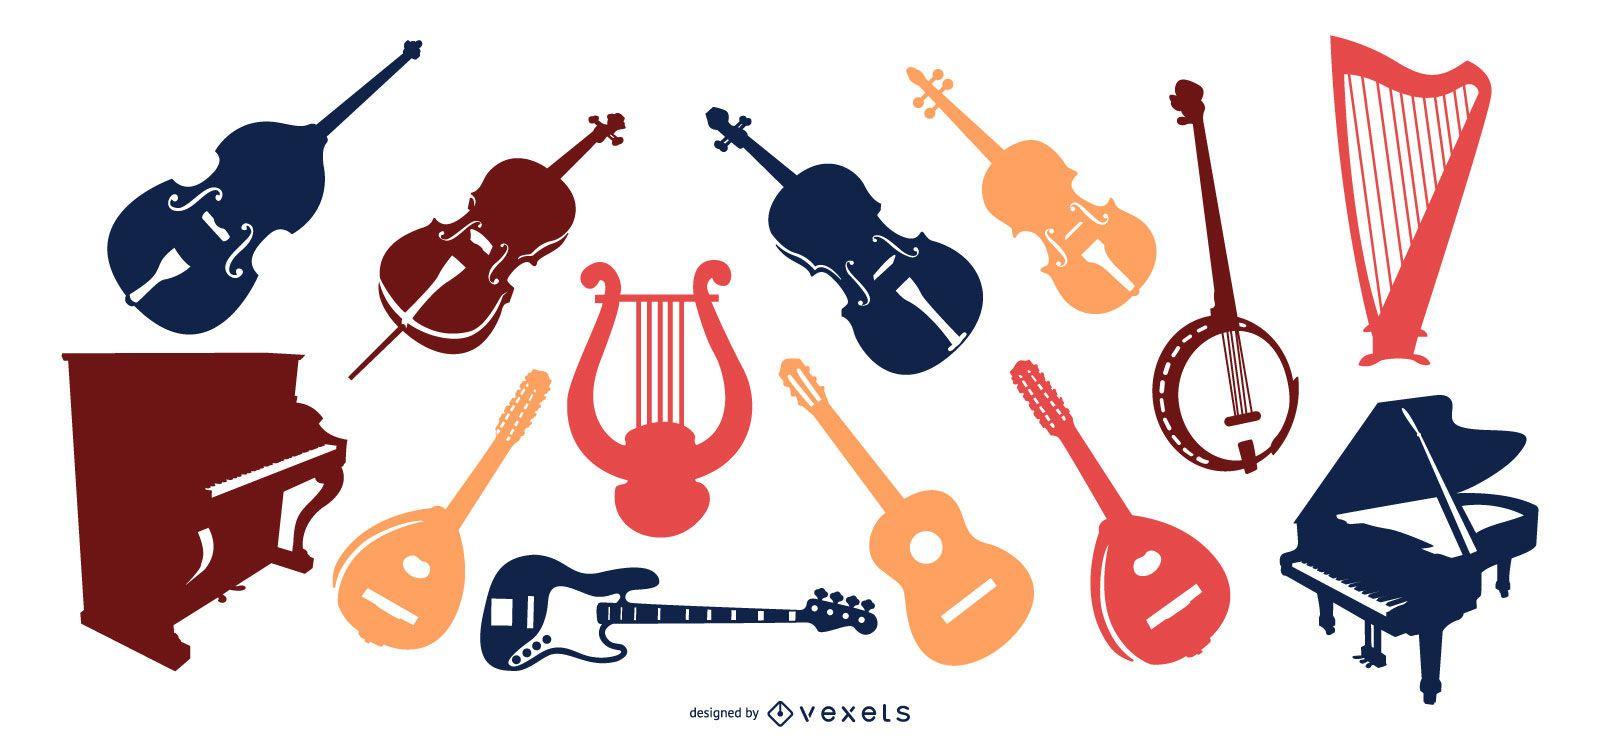 String Instrument Silhouette Vector Set